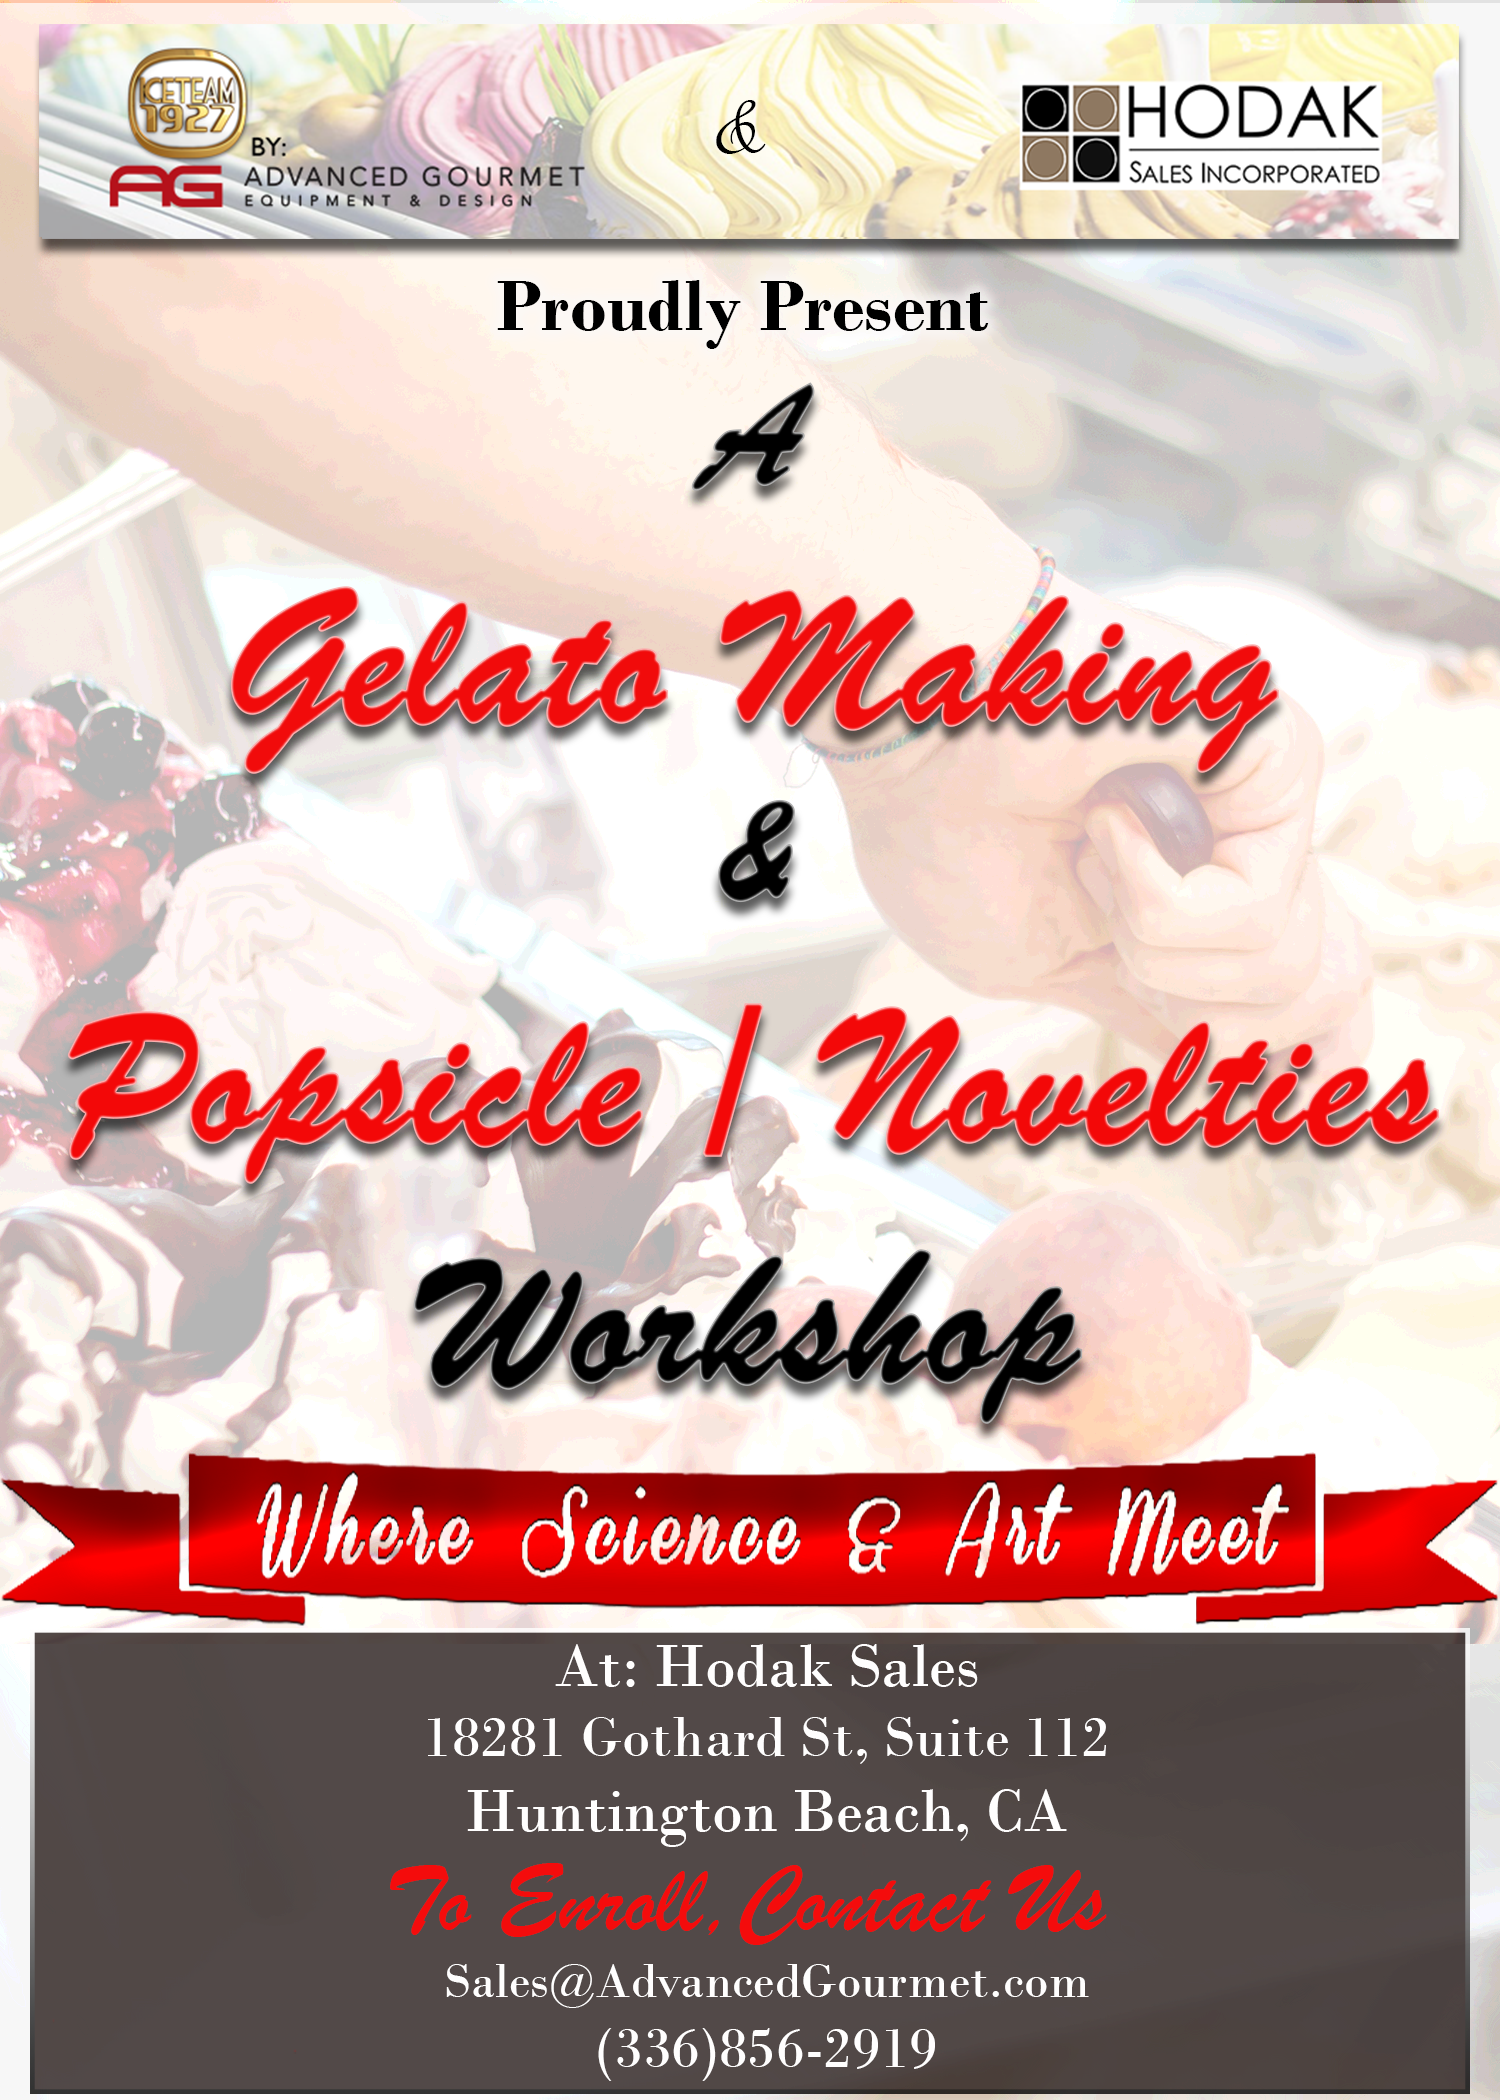 Gelato Making & Popsicle / Novelties Workshop by AG and Hodak